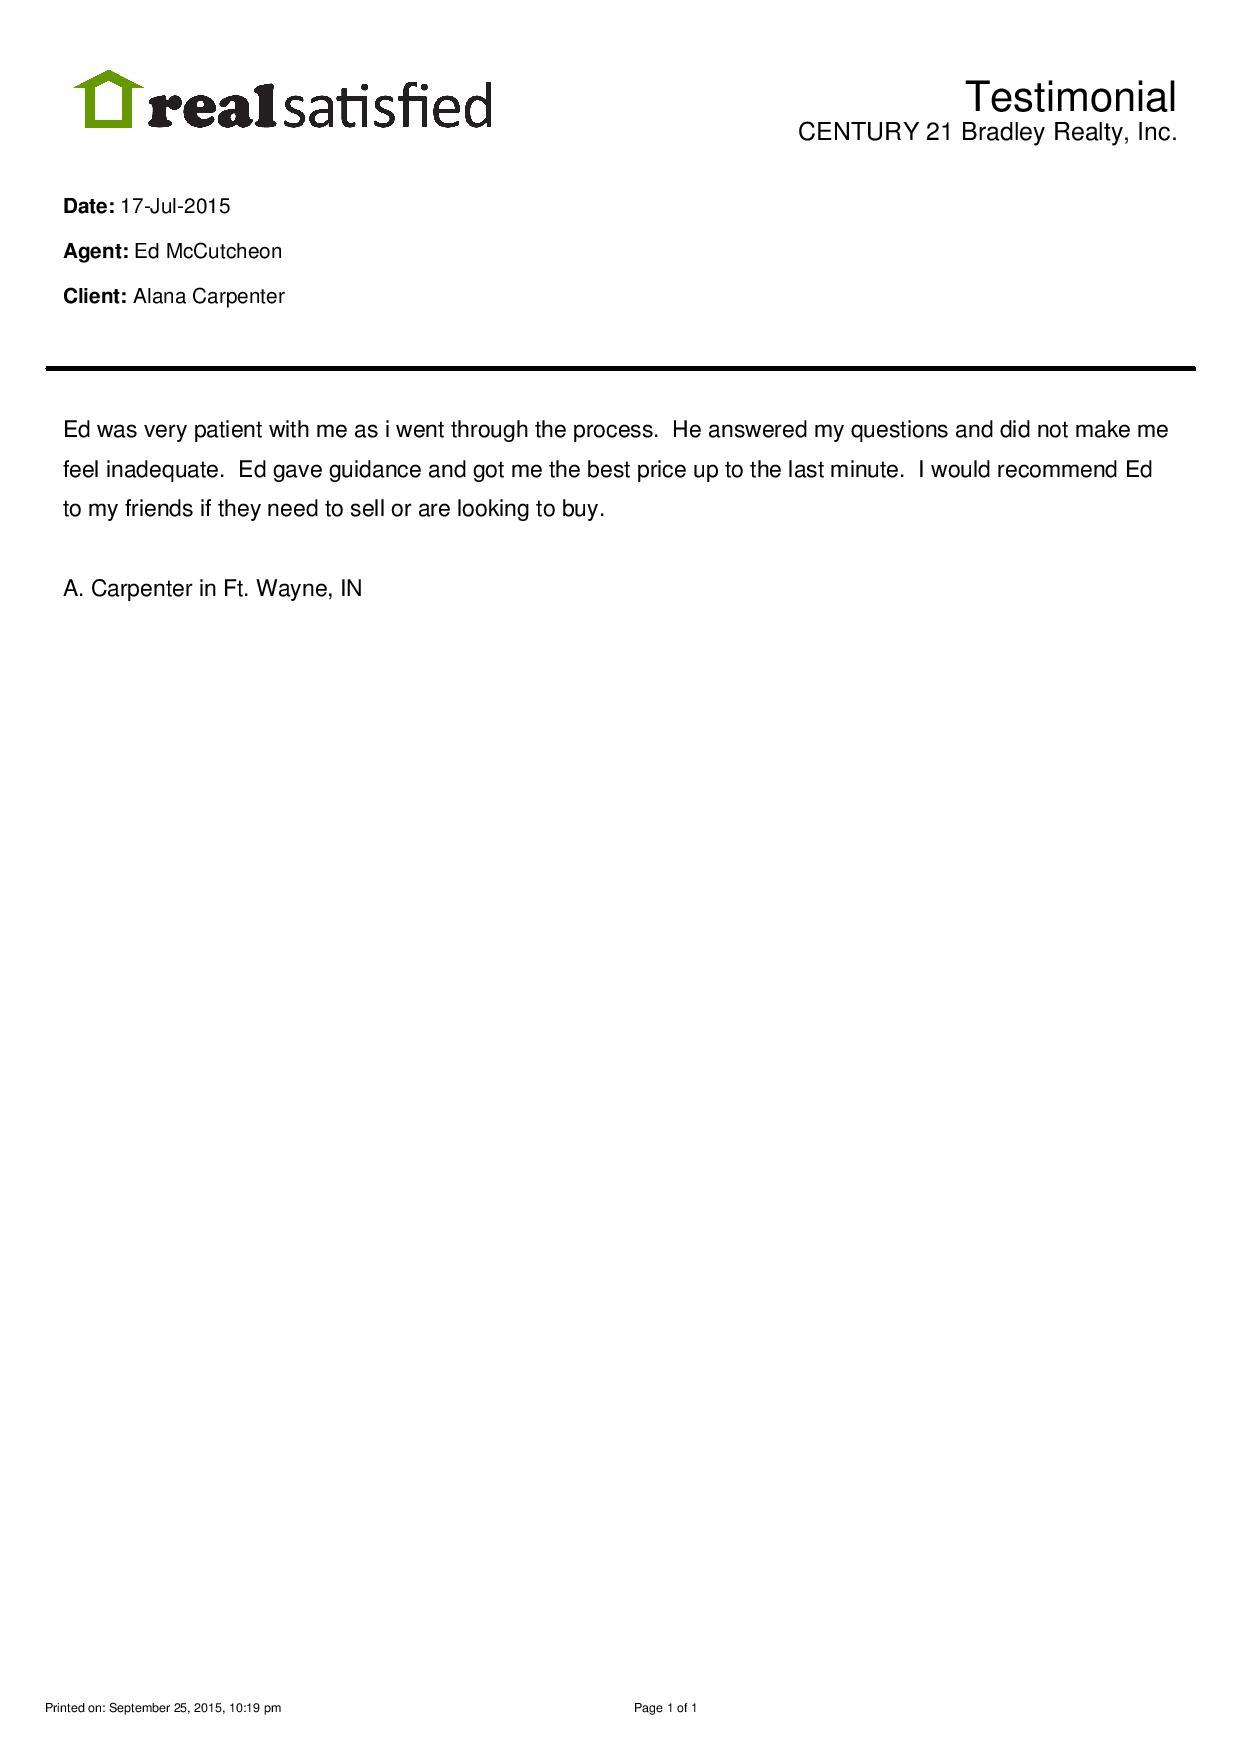 alana carpenter testimonial-page-001